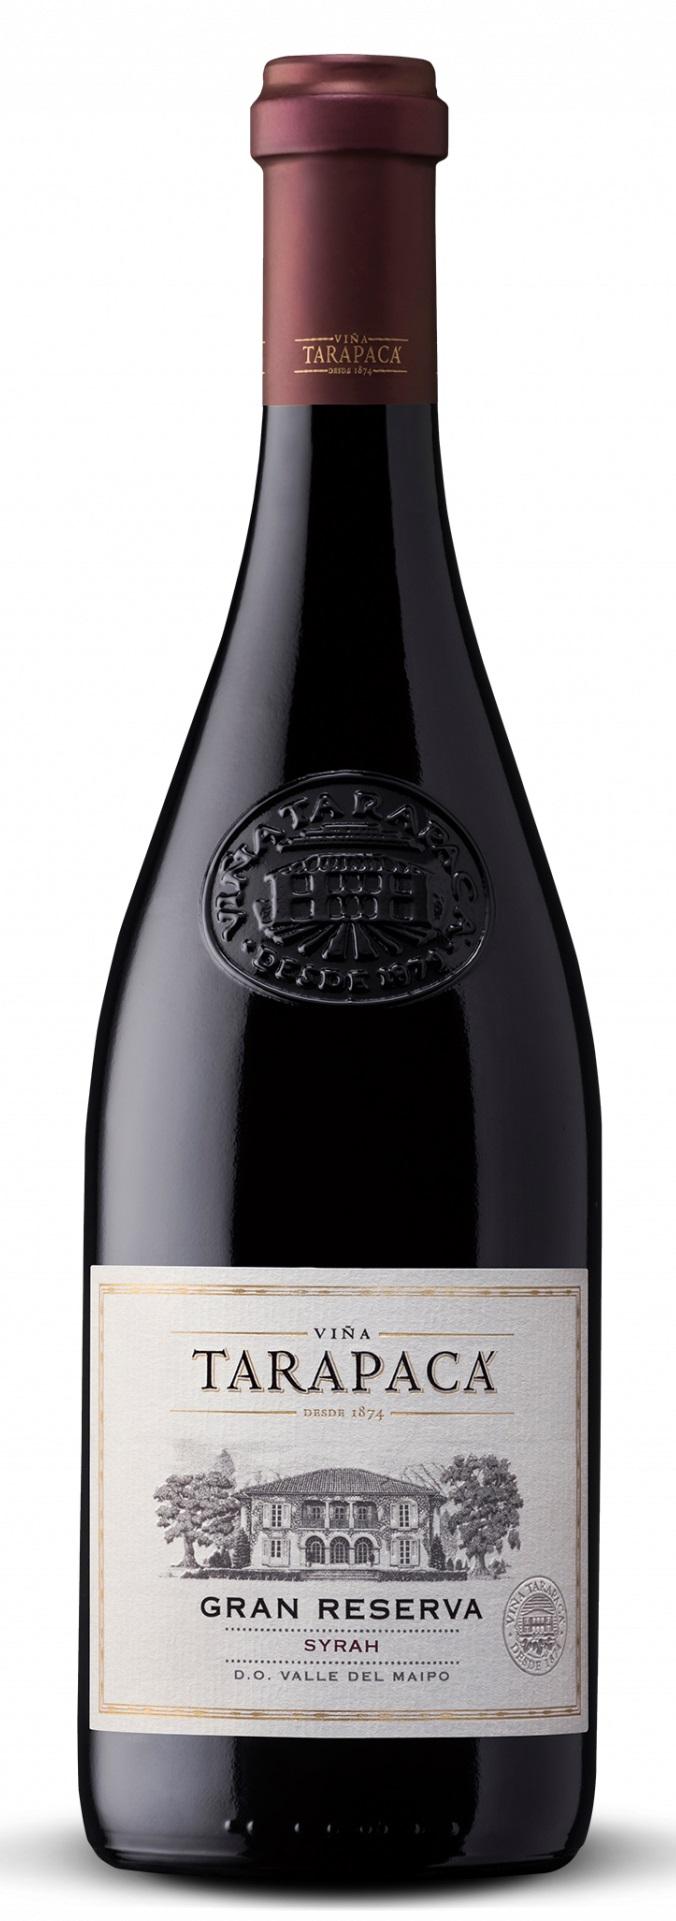 Vinařství Viňa Tarapacá Tarapacá, Syrah, Gran Reserva, 0,75l